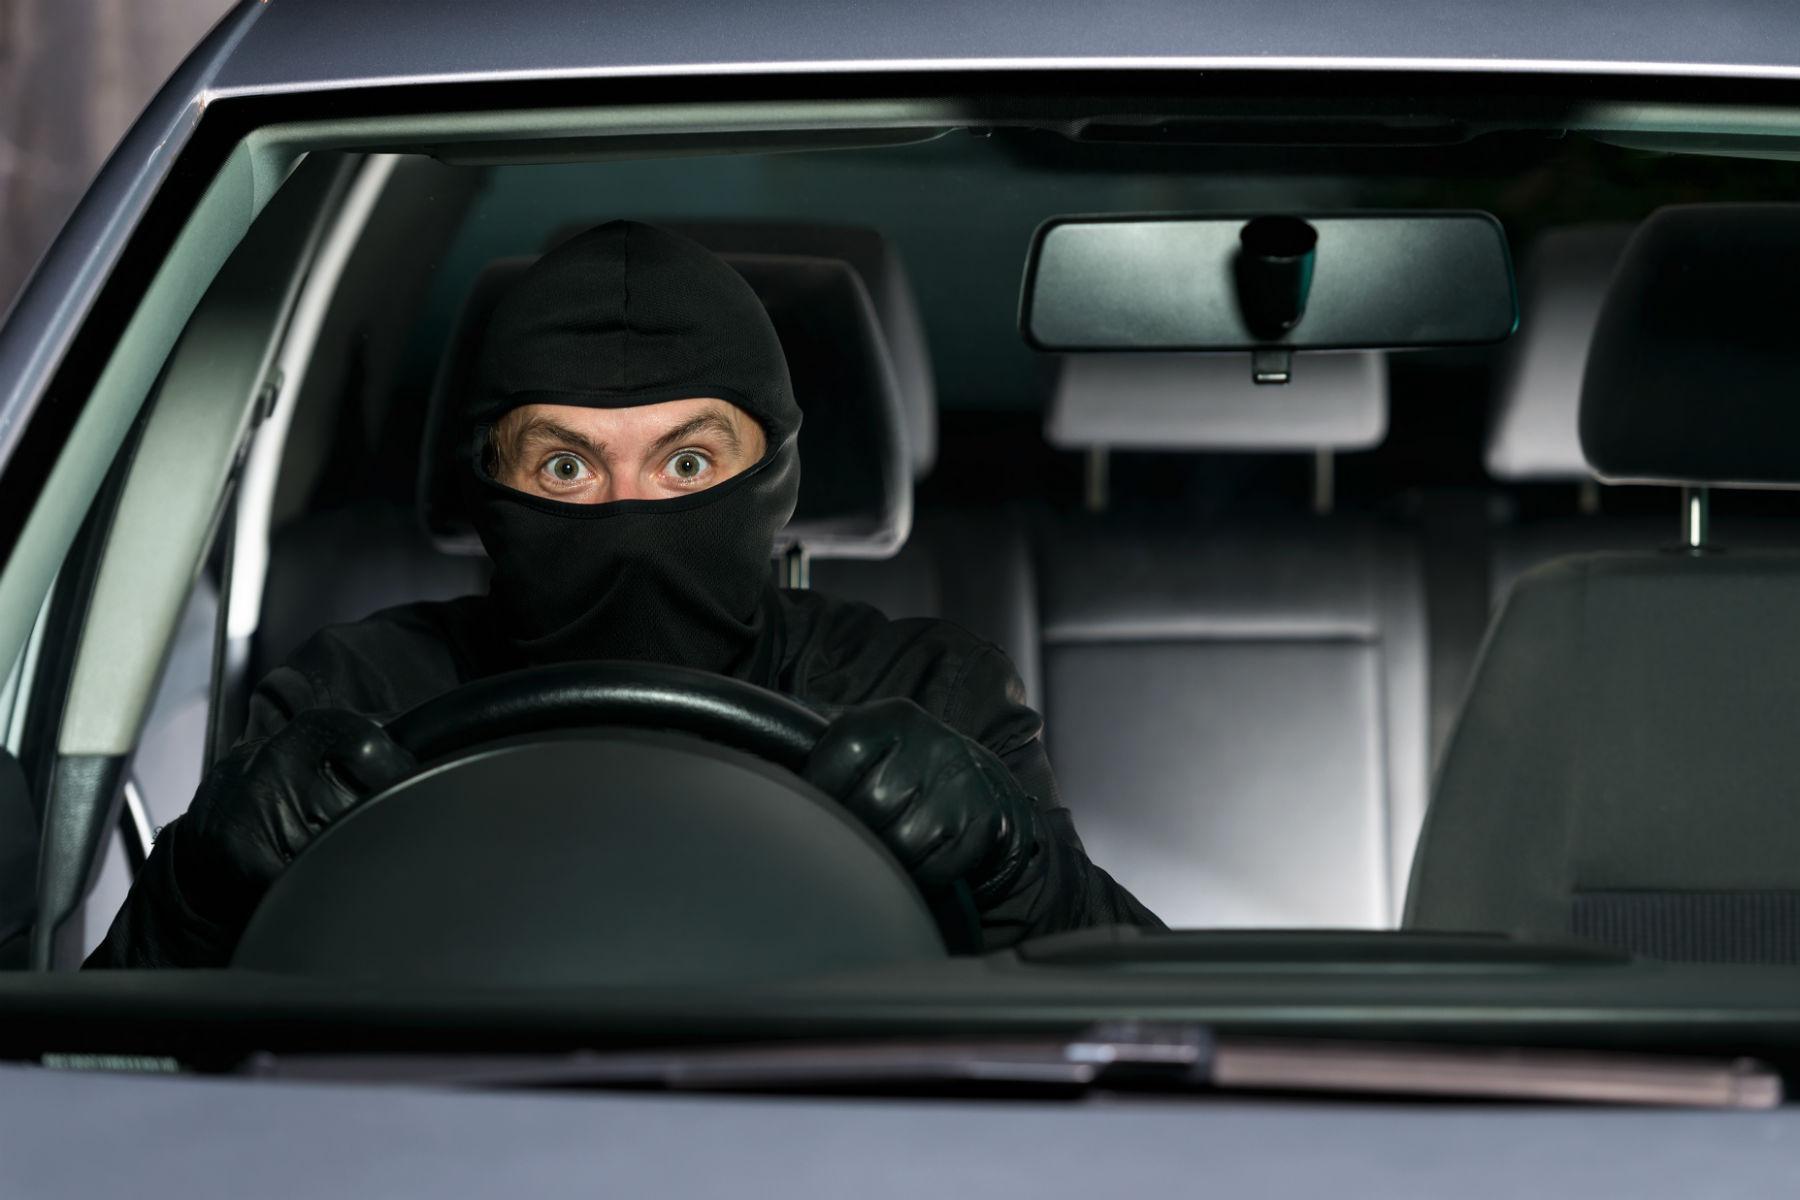 https://www.motoringresearch.com/wp-content/uploads/2017/11/stolen_car.jpg